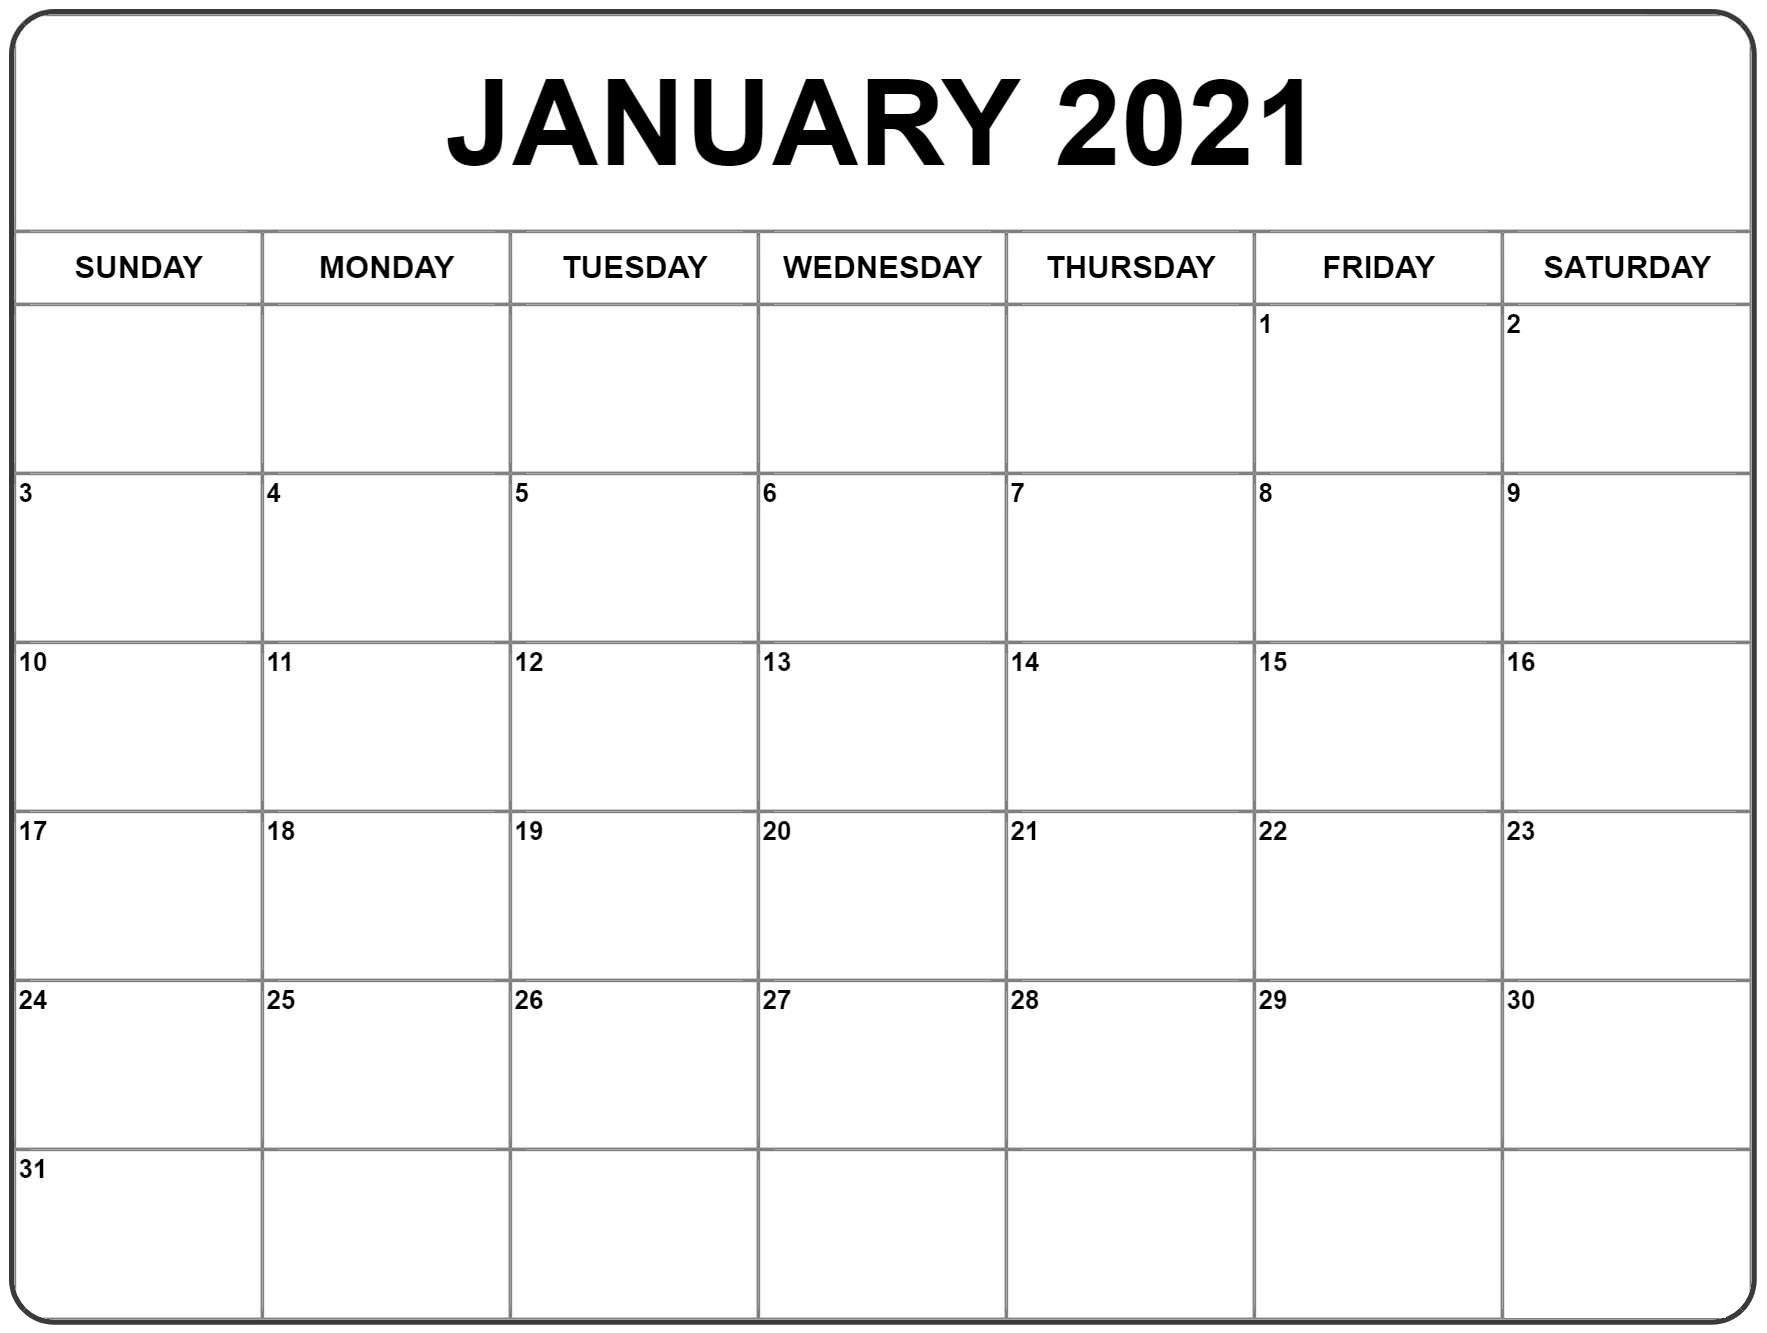 Free 2021 Printable Monthly Calendar With Holidays Word Pdf Landscape | Calendar Printables